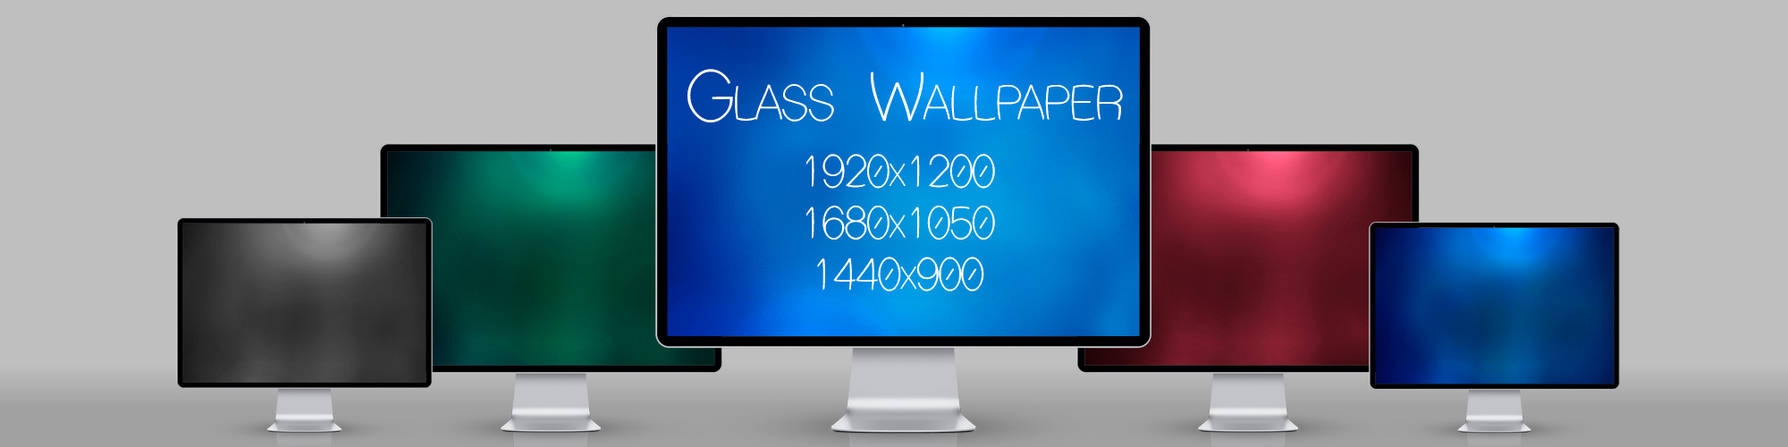 Wallapper Glass Recopilation